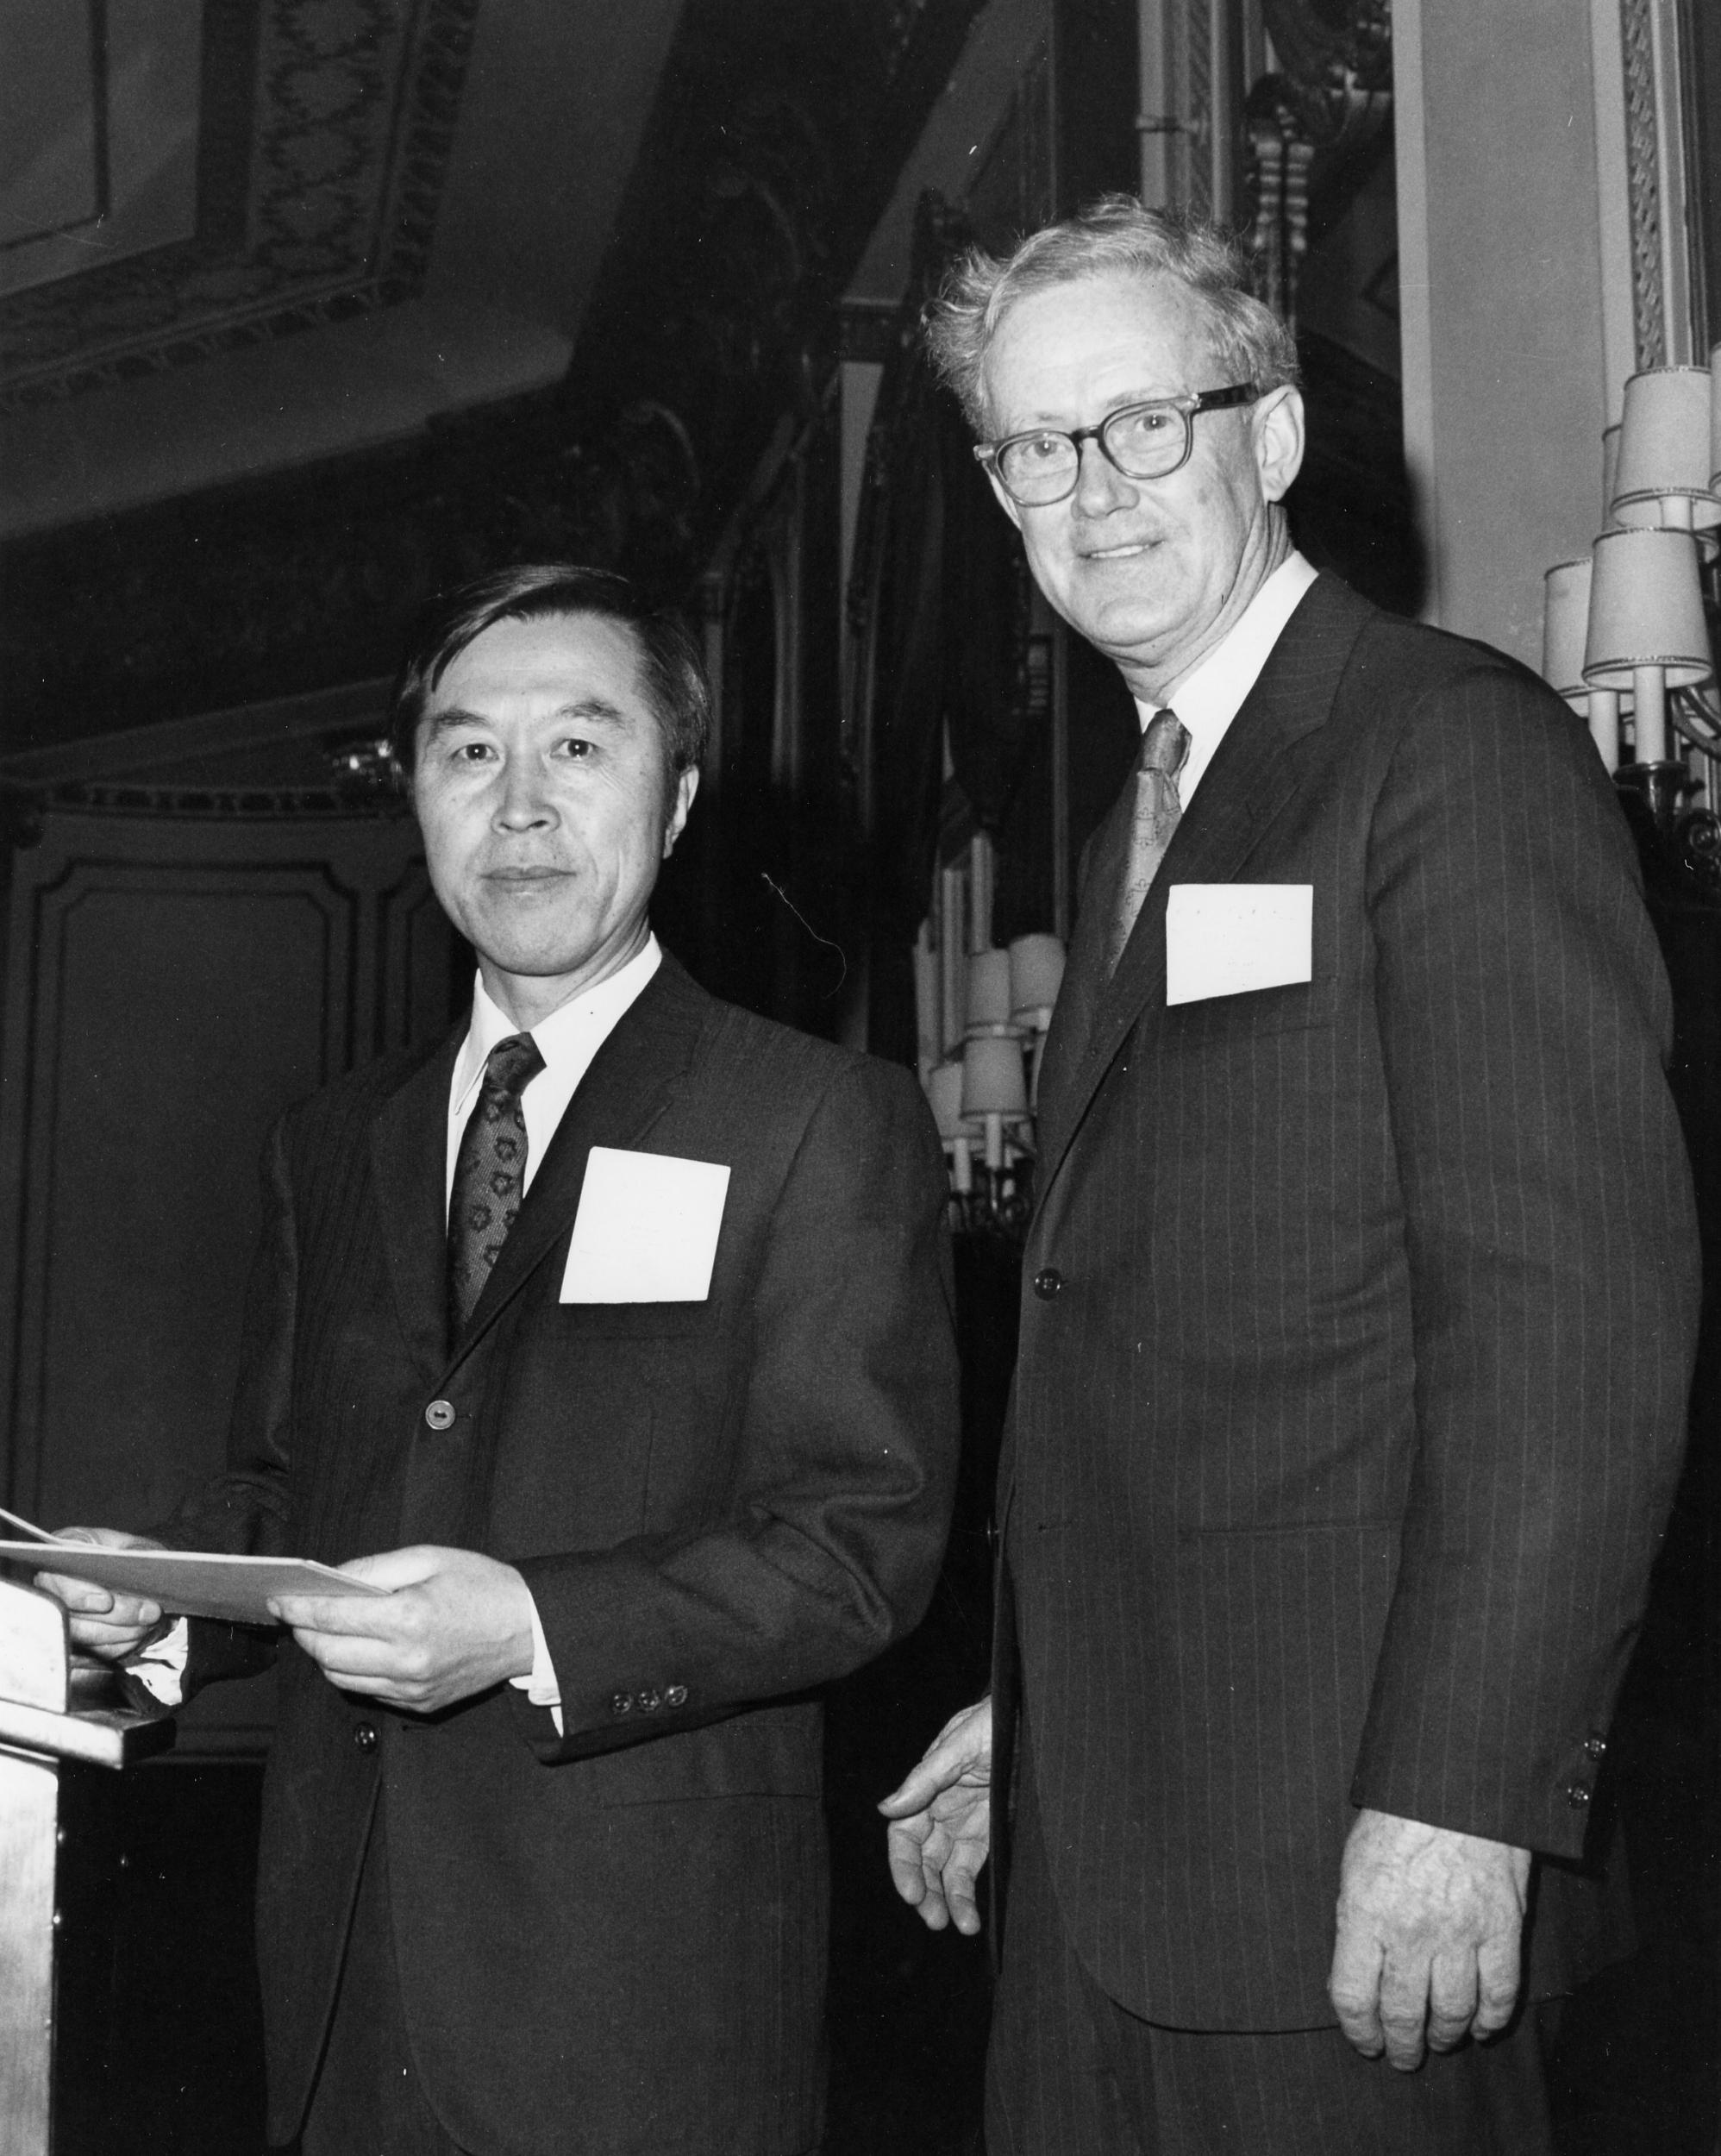 Yoichiro Nambu stands with Edward Purcell after winning the Dannie Heineman Prize